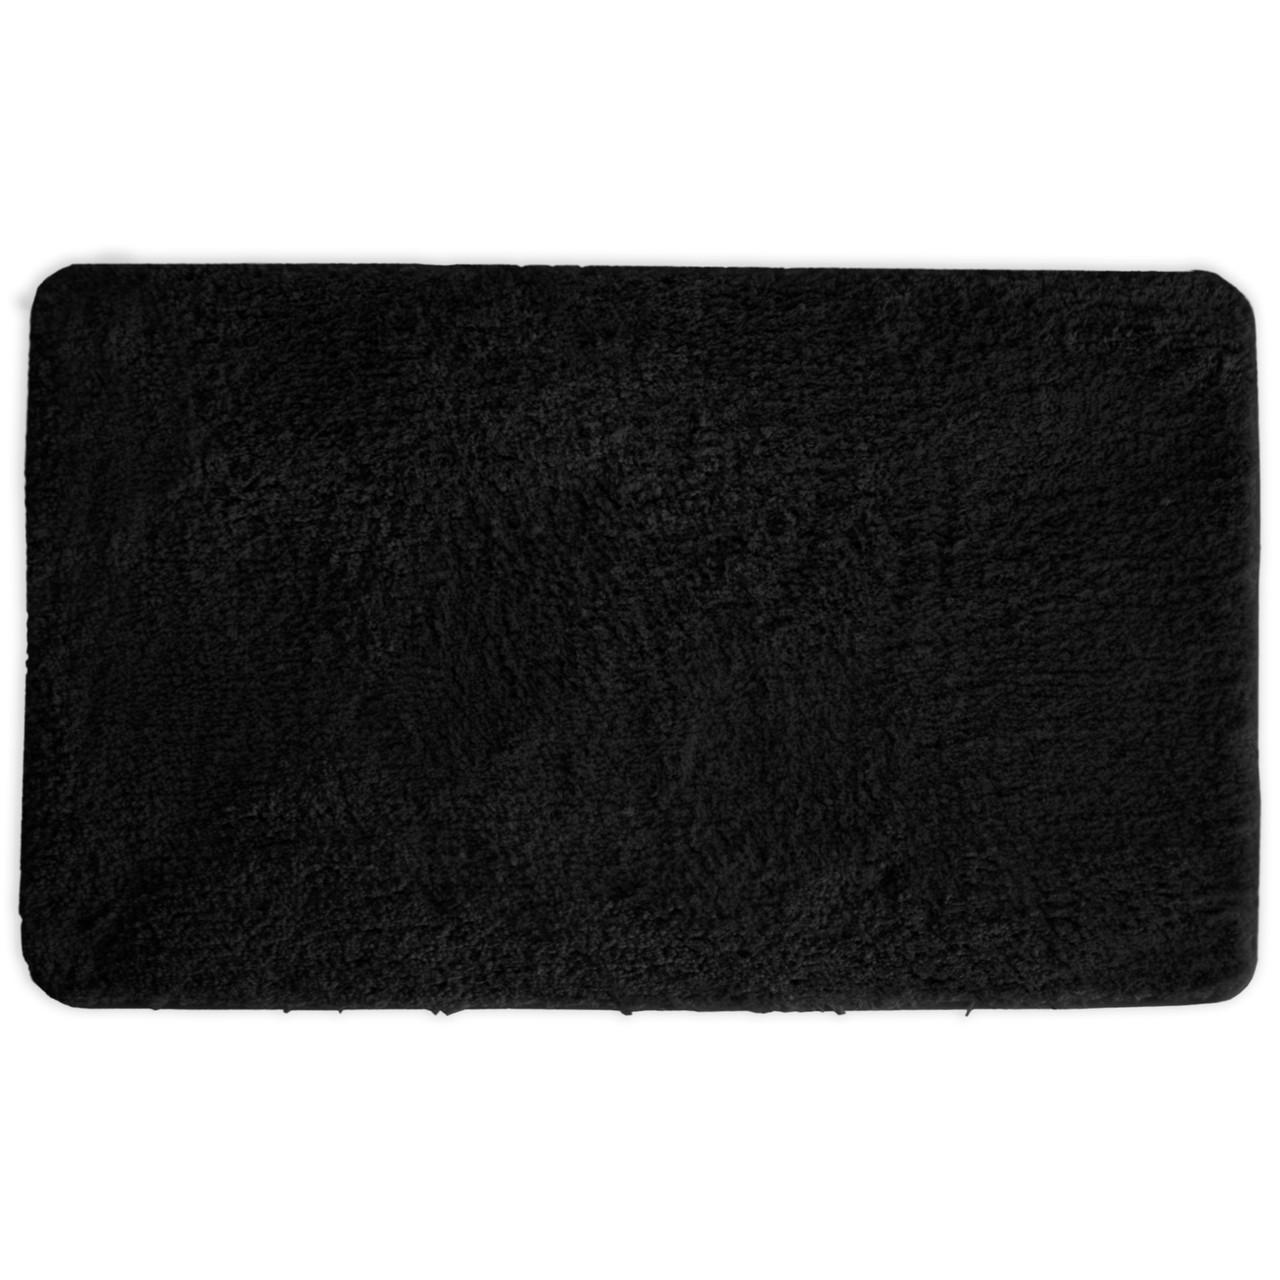 Mary Bathroom Rug Luxury Soft Plush Shaggy Thick Fluffy Microfiber Bath Mat Non Slip Rubber Back Floor Mat Water Absorbent